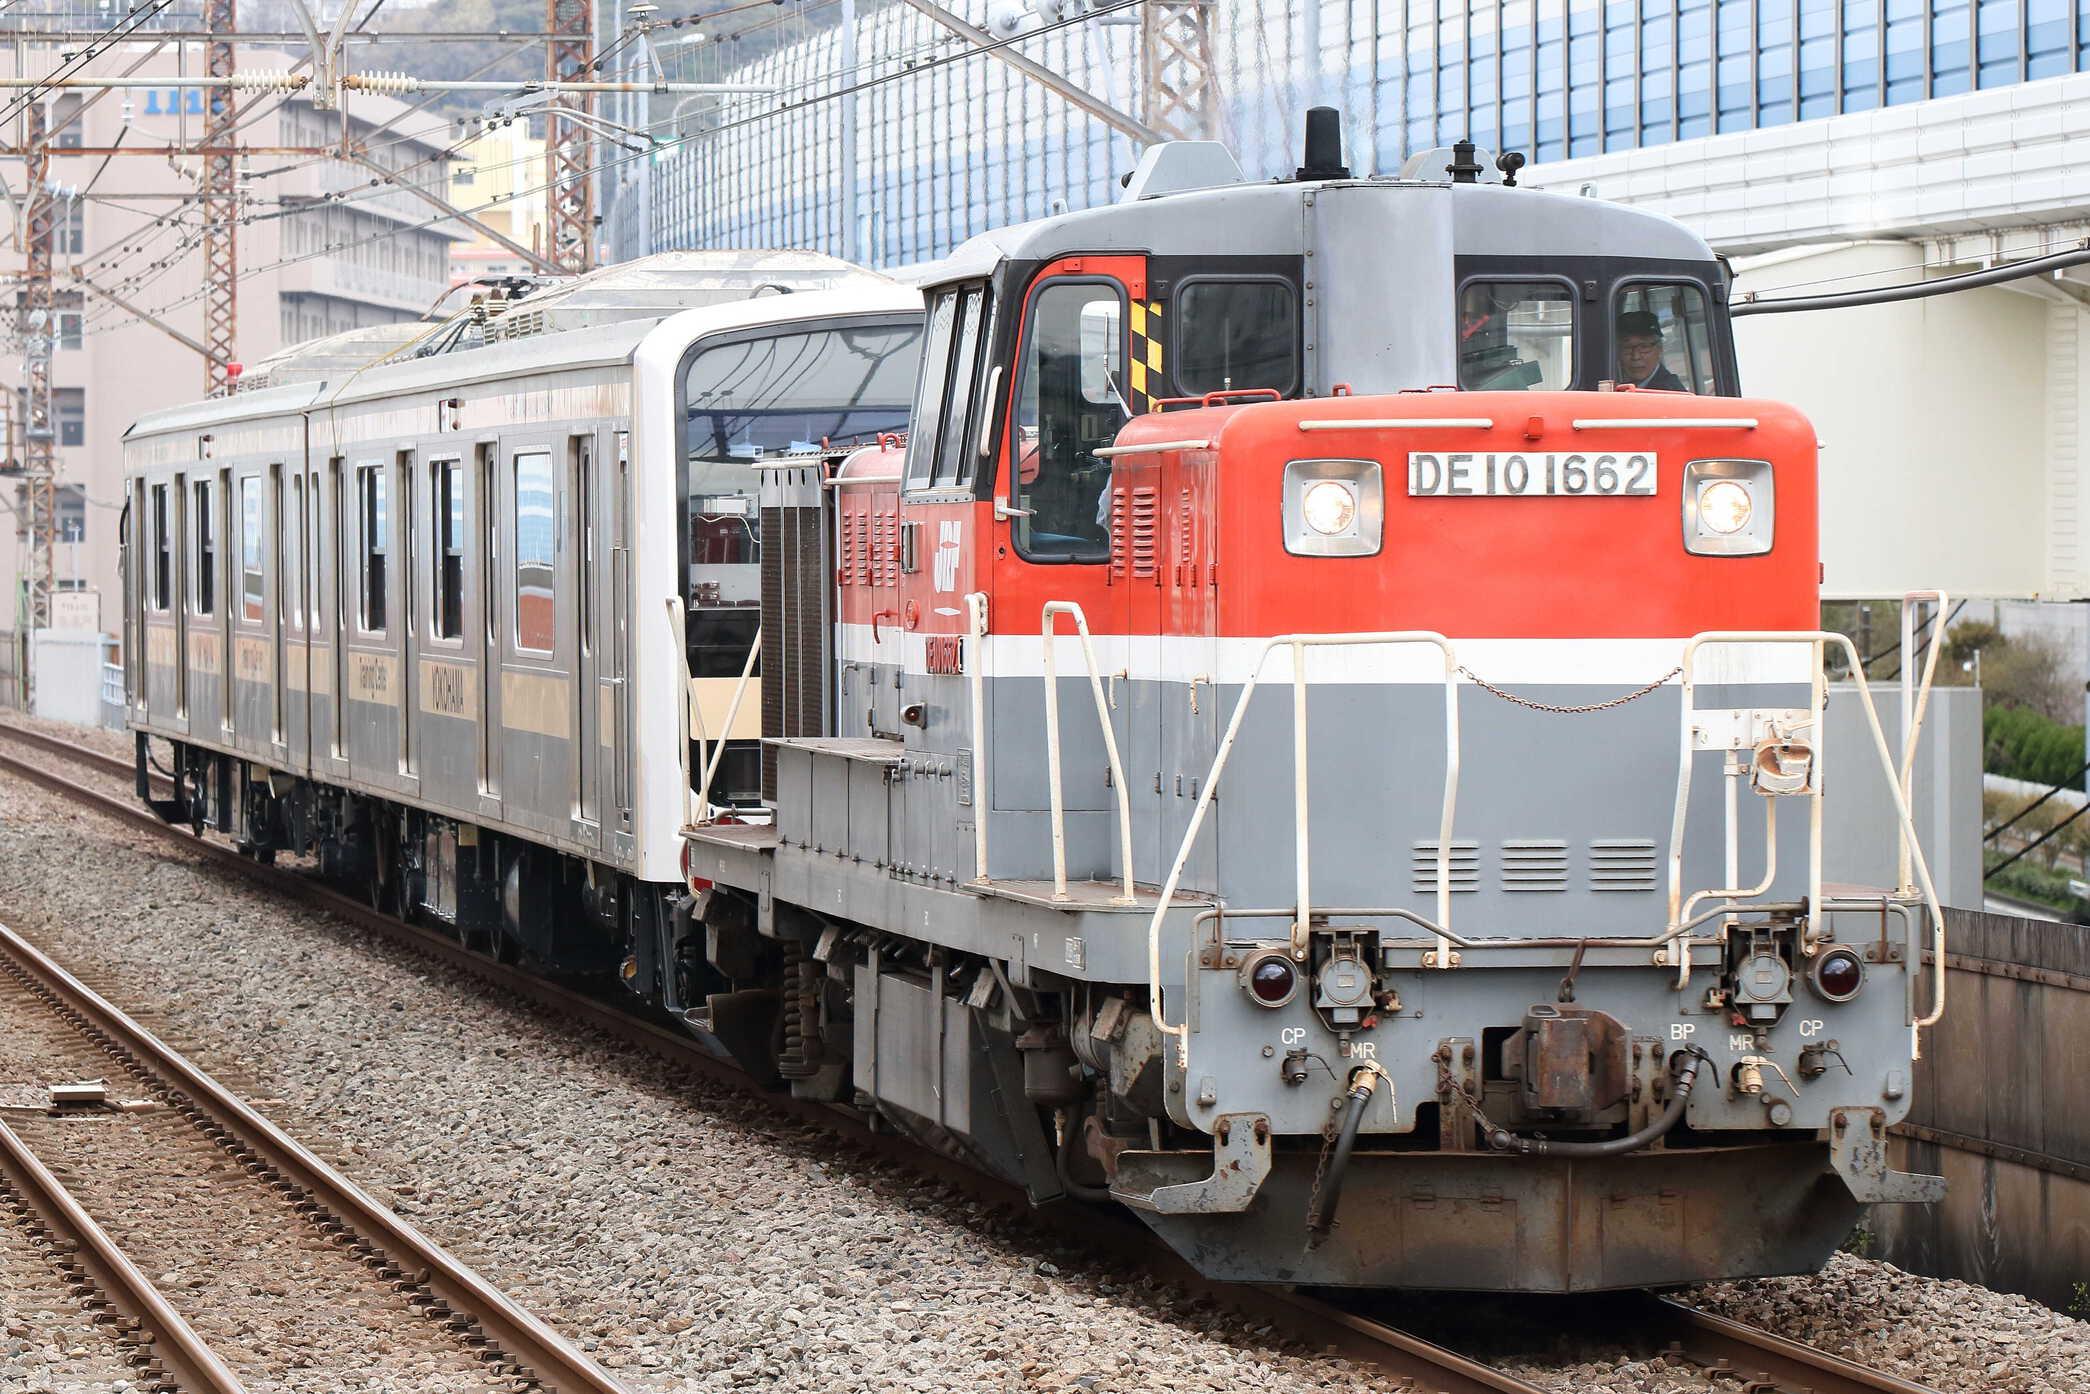 9597列車 甲57(郡山〜逗子) KY出場甲種輸送 DE10-1662[新]+横浜総合訓練センター訓練車2車(モハ209-39+モハ208-39)